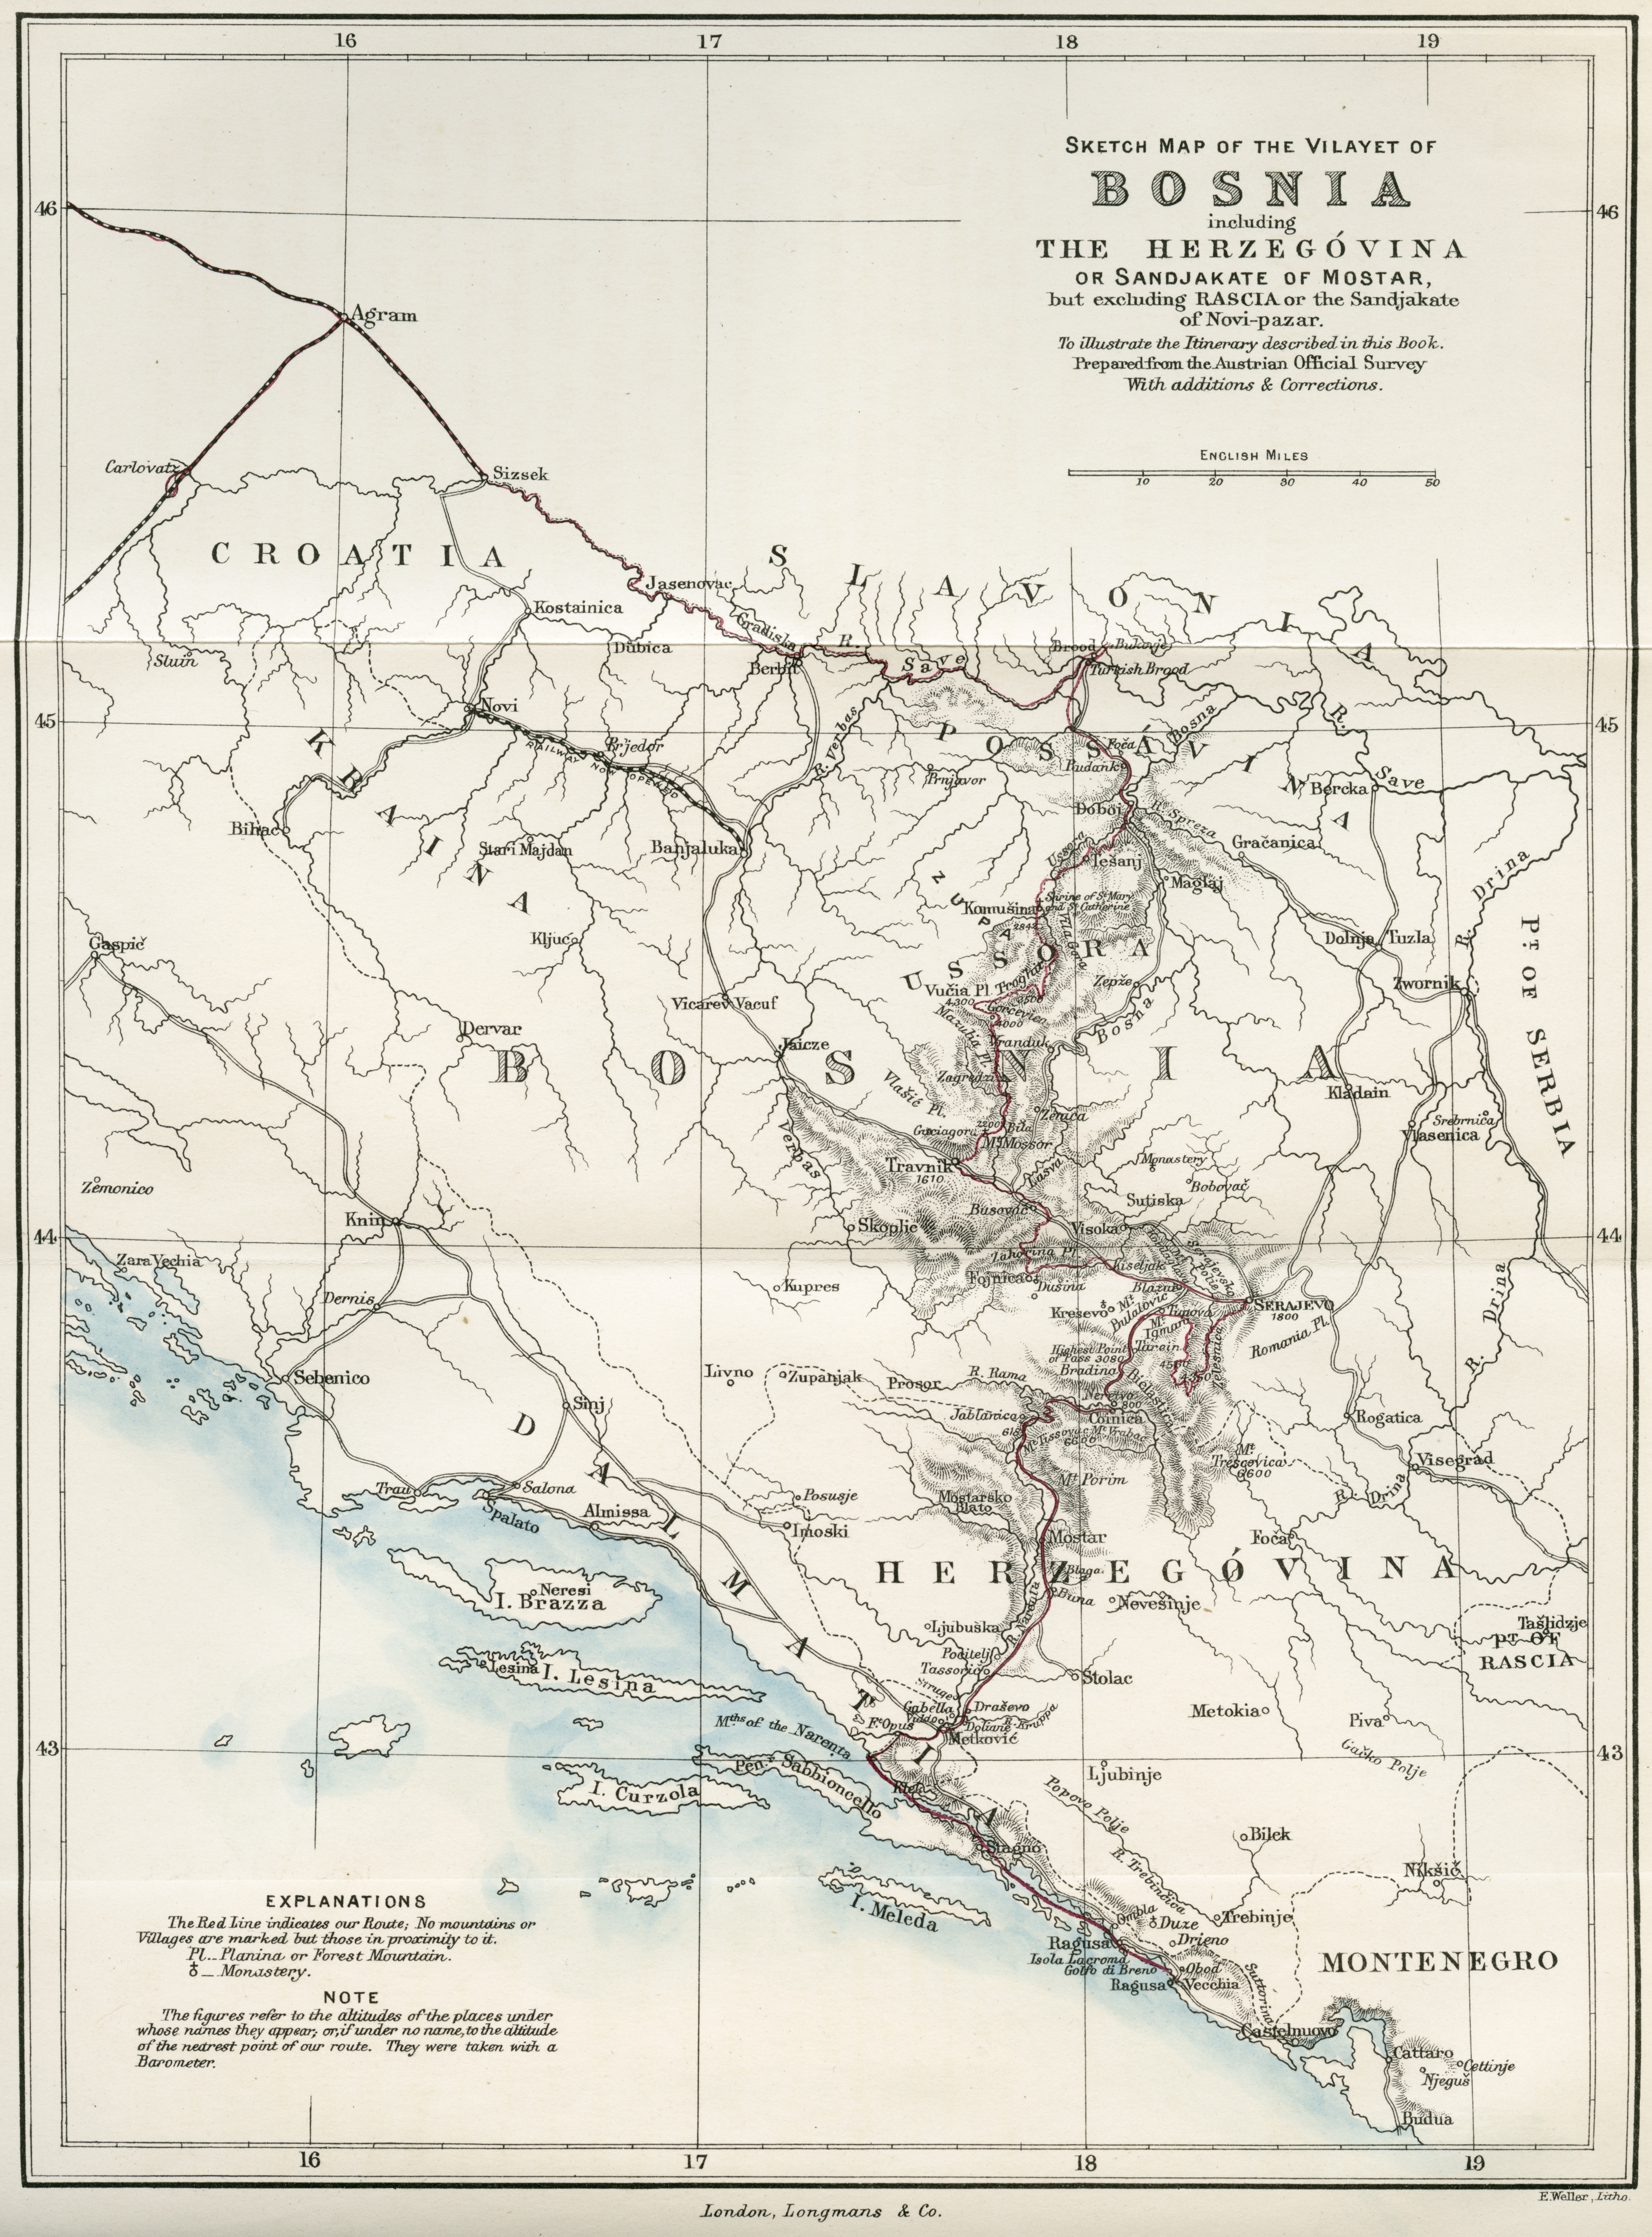 Map of Bosnia and Herzegovina (1875)   cabinet Map Bosnia Herzegovina on croatia map, luxembourg map, eritrea map, bulgaria map, srebrenica massacre, monaco map, serbia map, austria map, iran map, bosnian war, vatican city map, turkey map, estonia map, albania map, slovakia map, slovenia map, republika srpska, macedonia map, hungary map, ukraine map, kosovo map, republic of macedonia, san marino map,